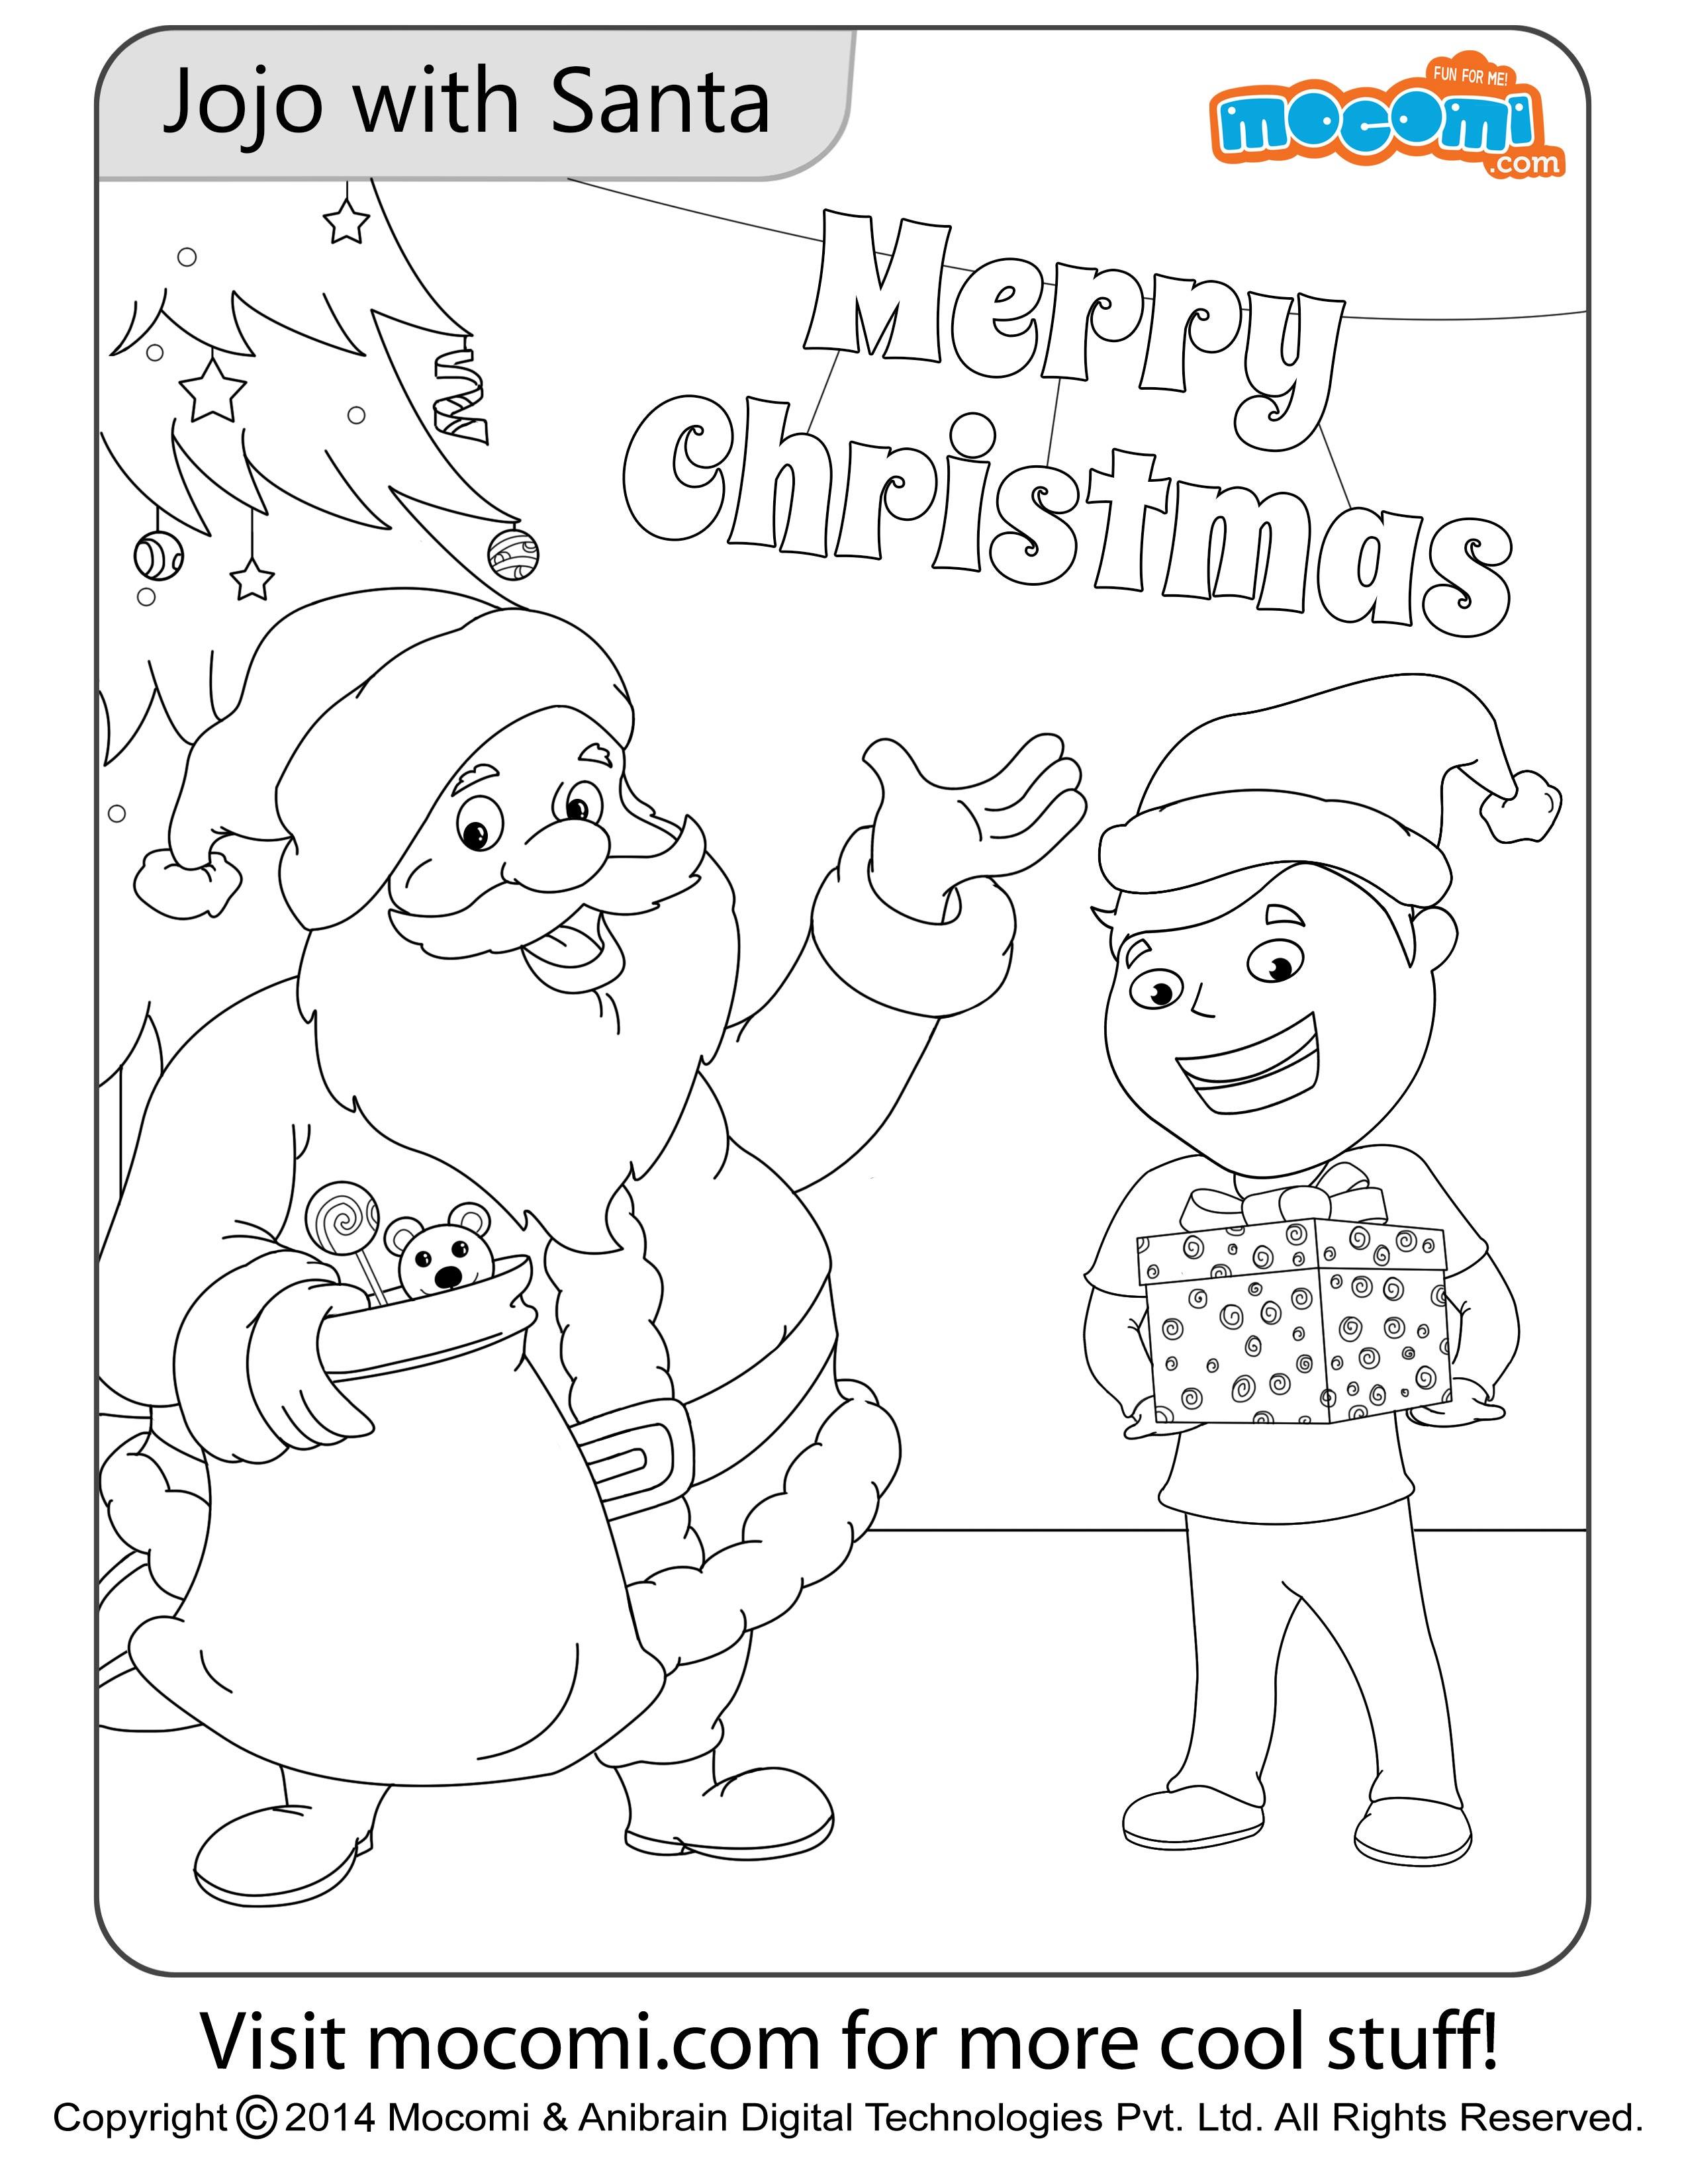 Jojo with Santa – Colouring Page